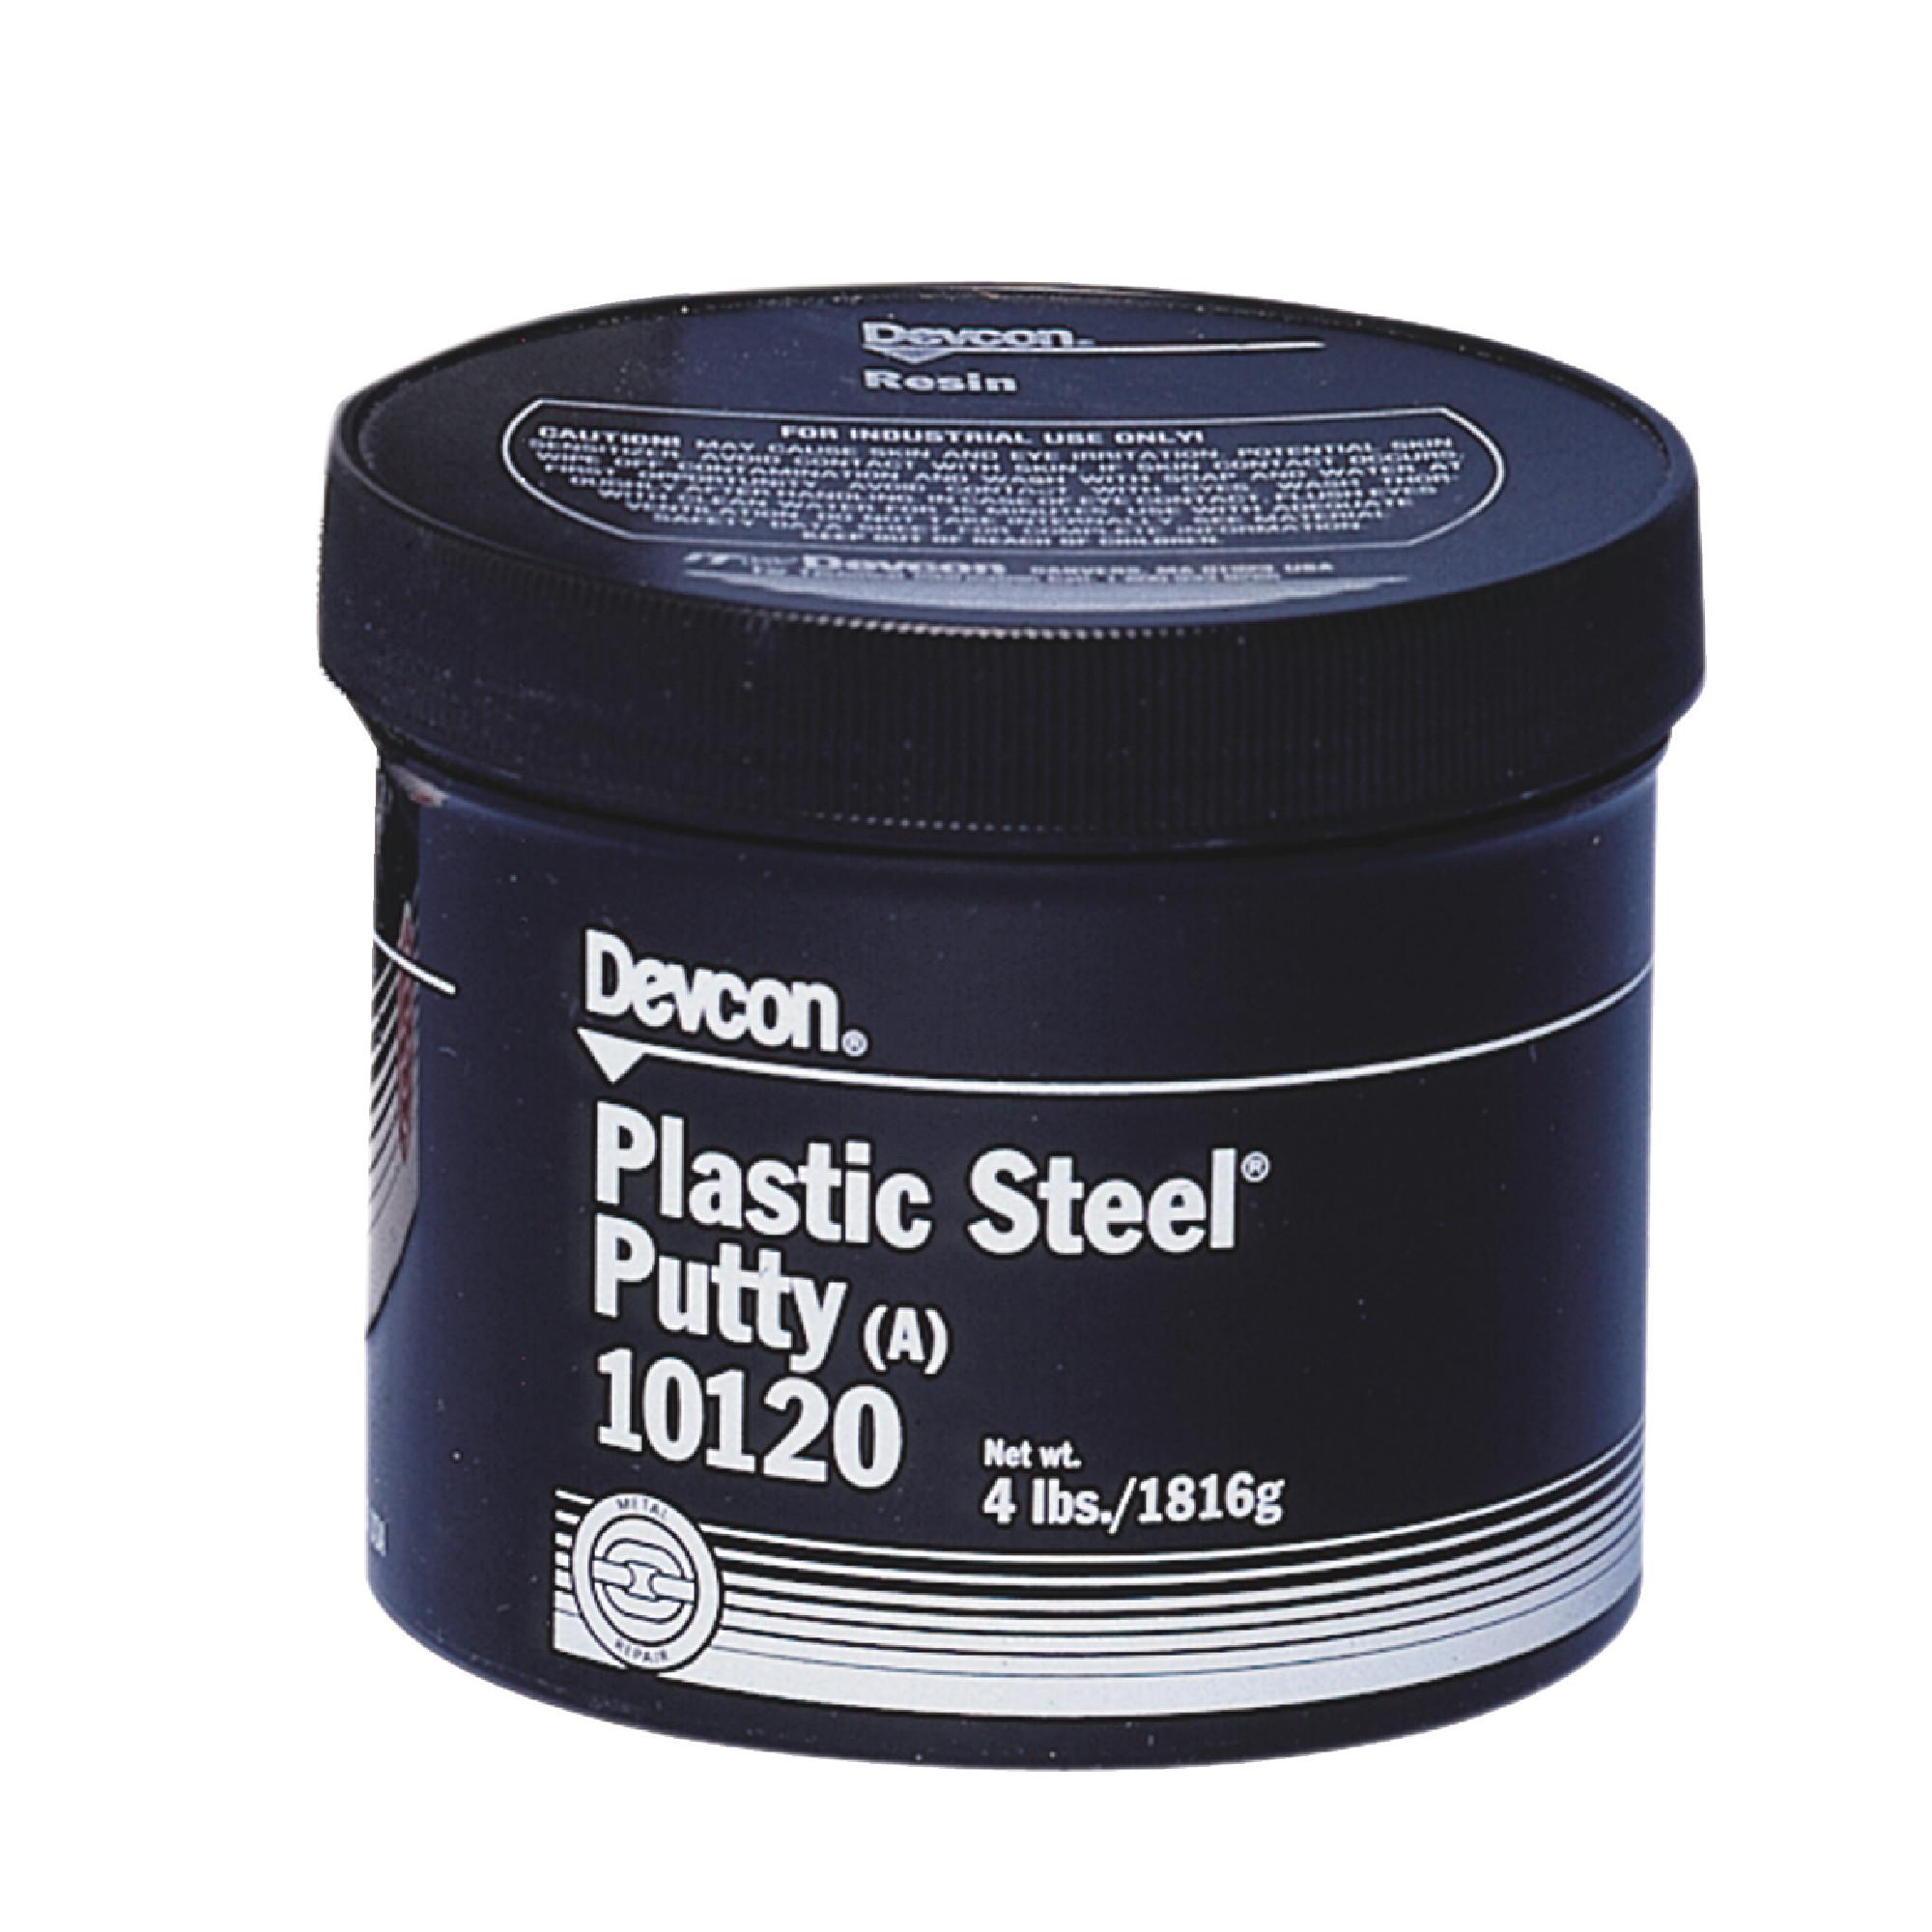 Plastic Steel® Putty (A)